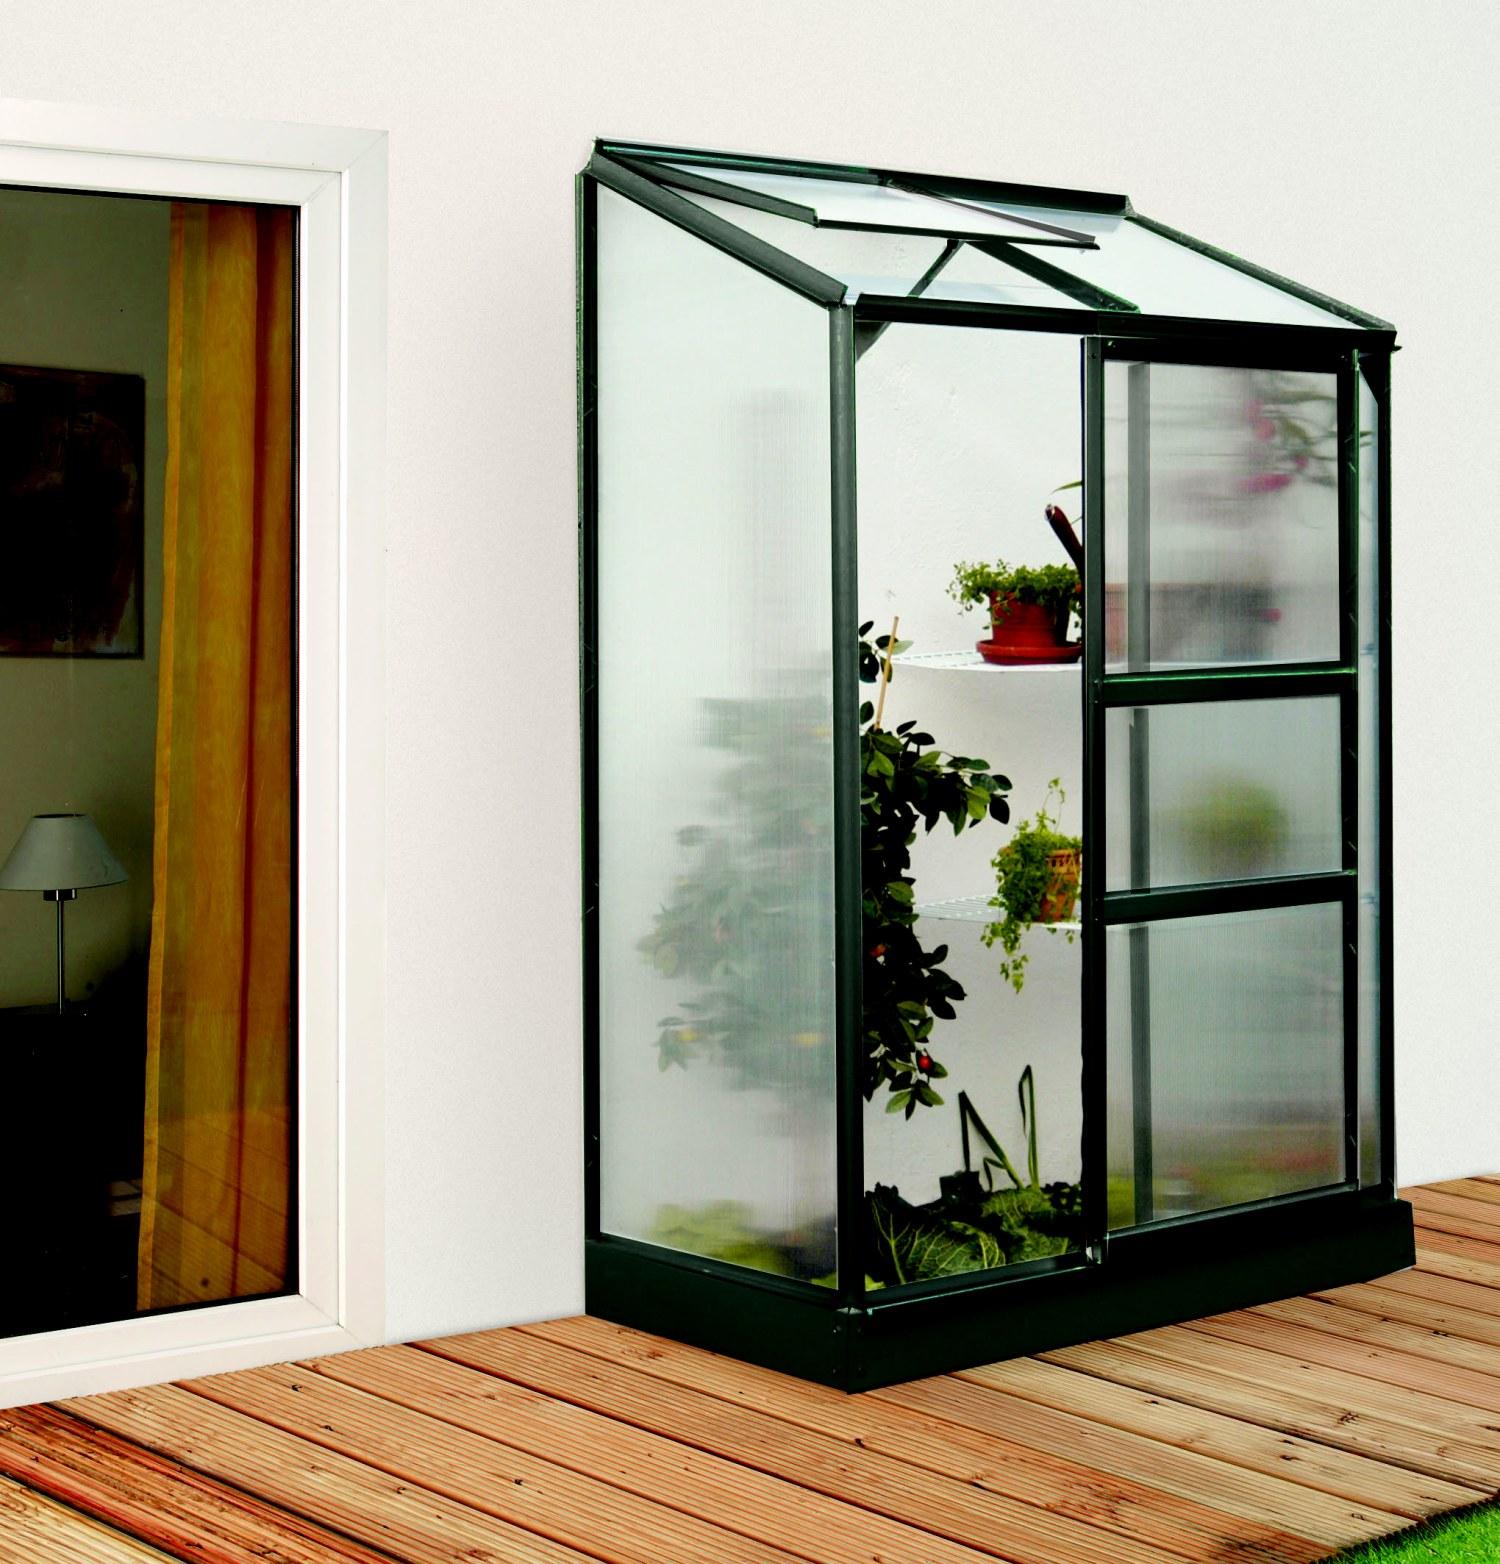 skleník VITAVIA IDA 900 PC 4 mm zelený